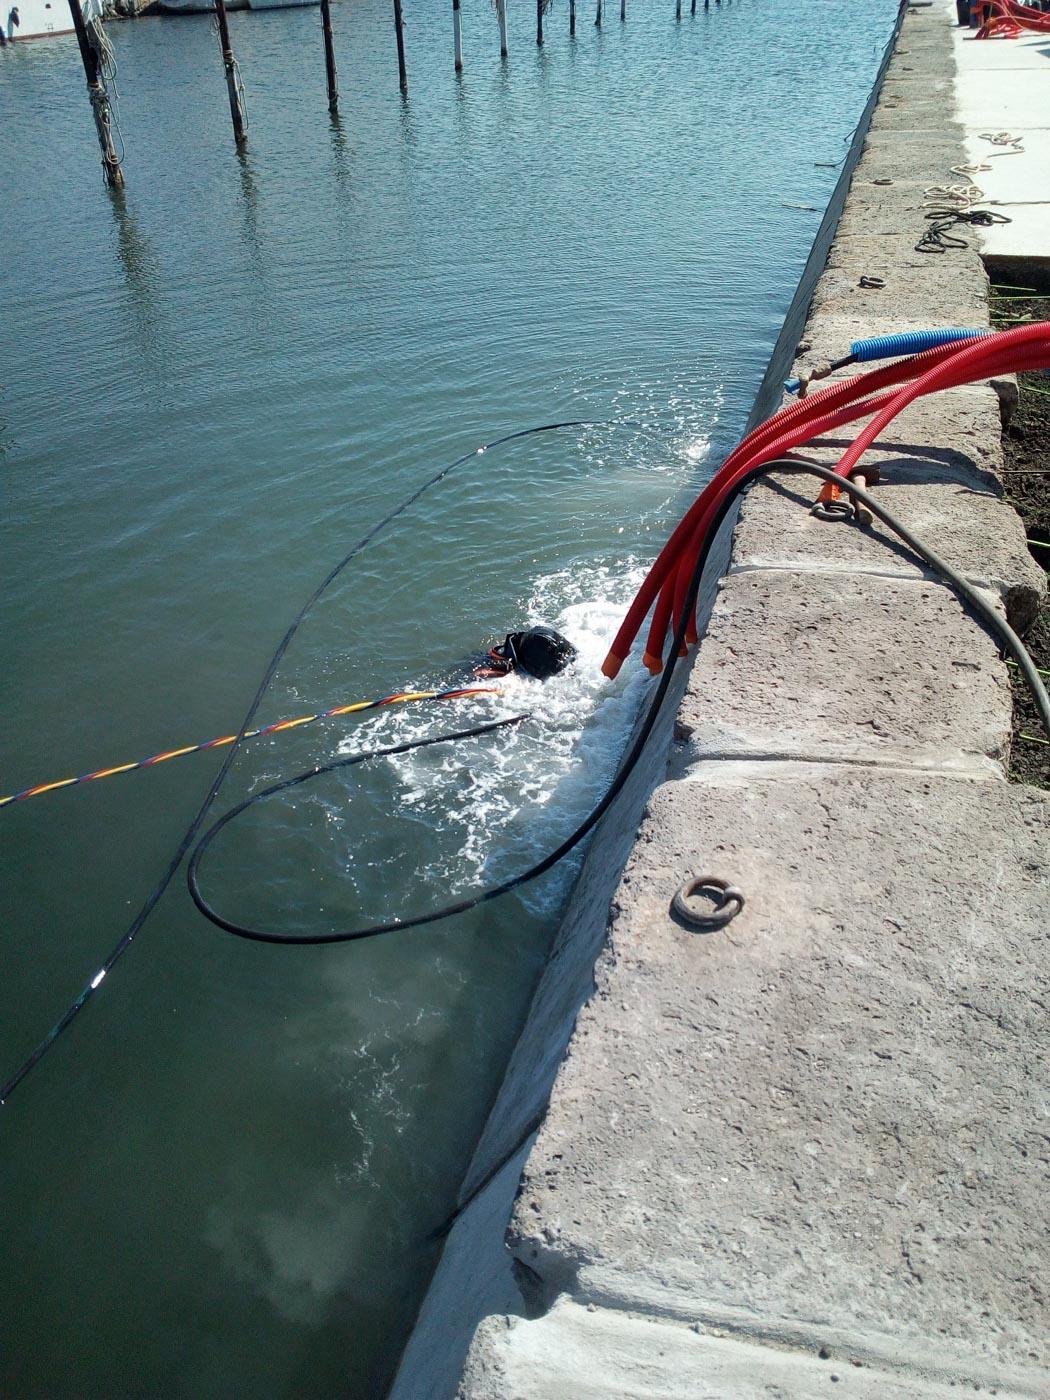 piqueur-sous-marin-sete-travaux